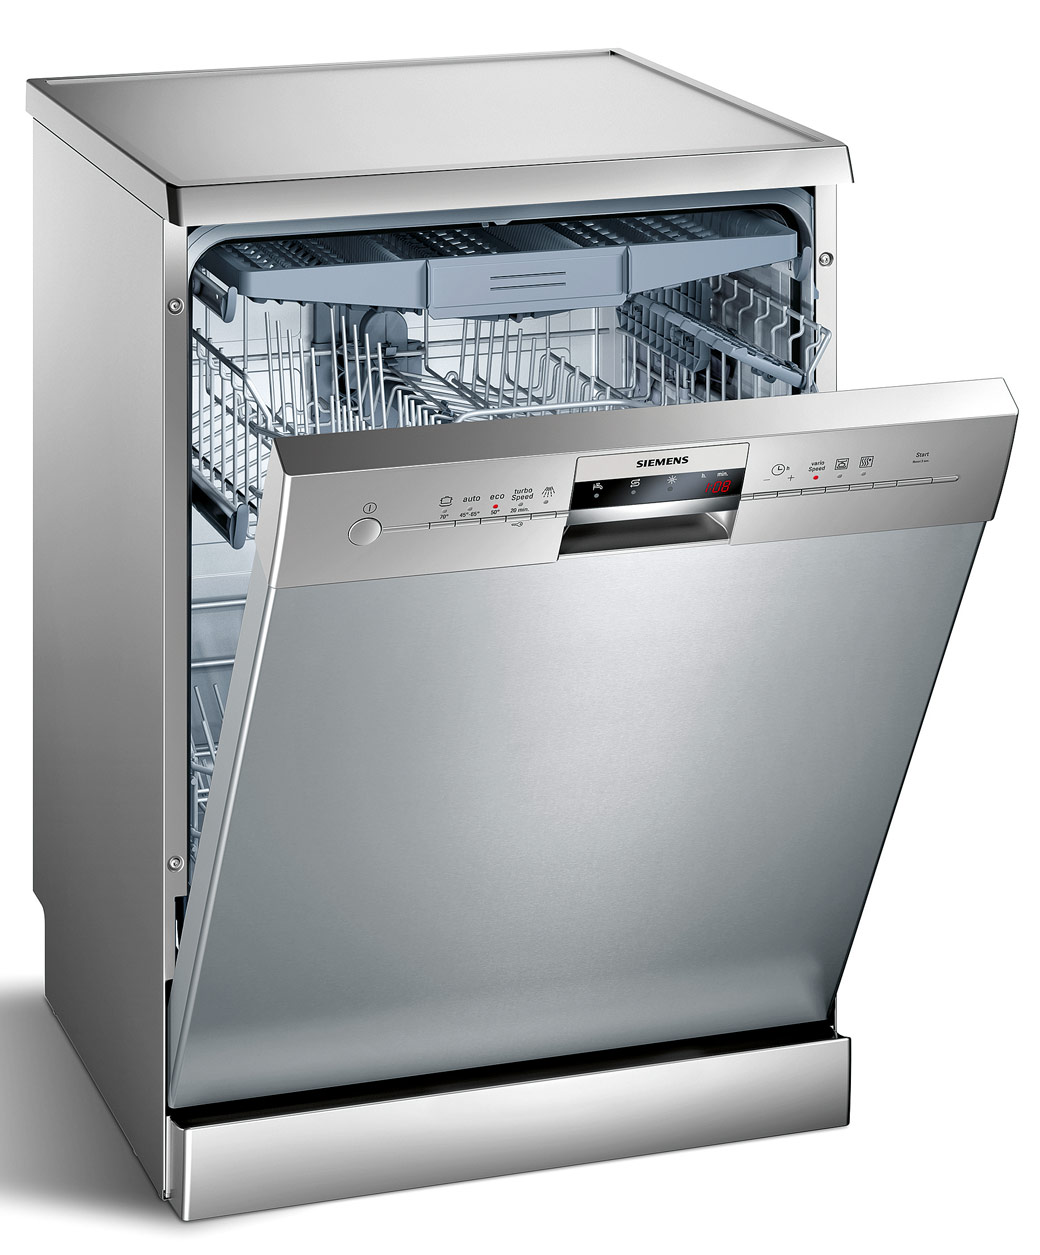 Lave vaisselle siemens lave vaisselle encastrable siemens sn66p092eu 4120272 lave vaisselle - Lave vaisselle siemens darty ...